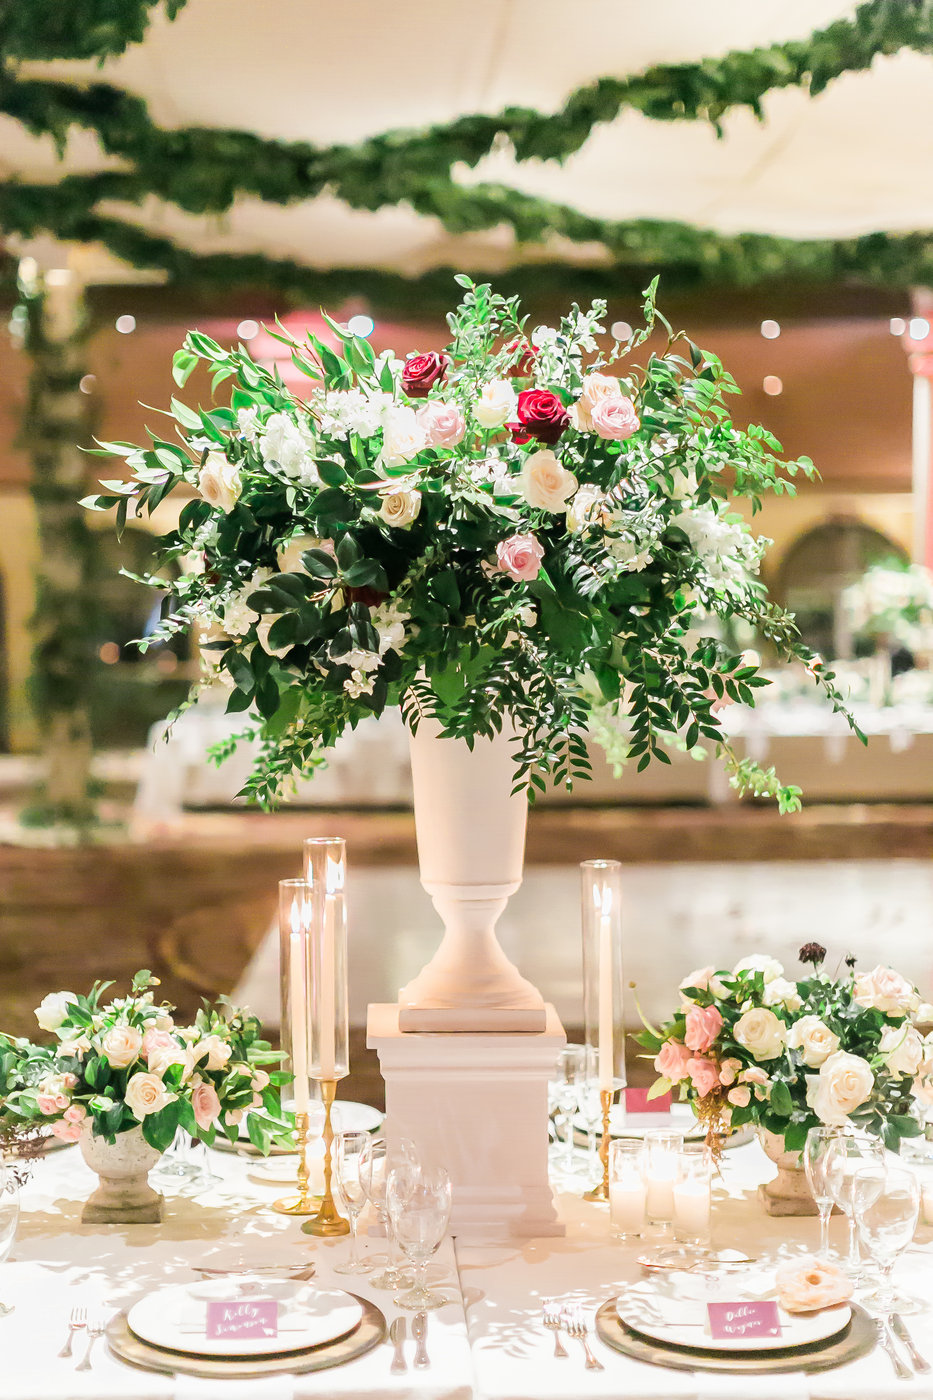 wedding reception centerpieces las vegas wedding planner angelica rose events.jpg